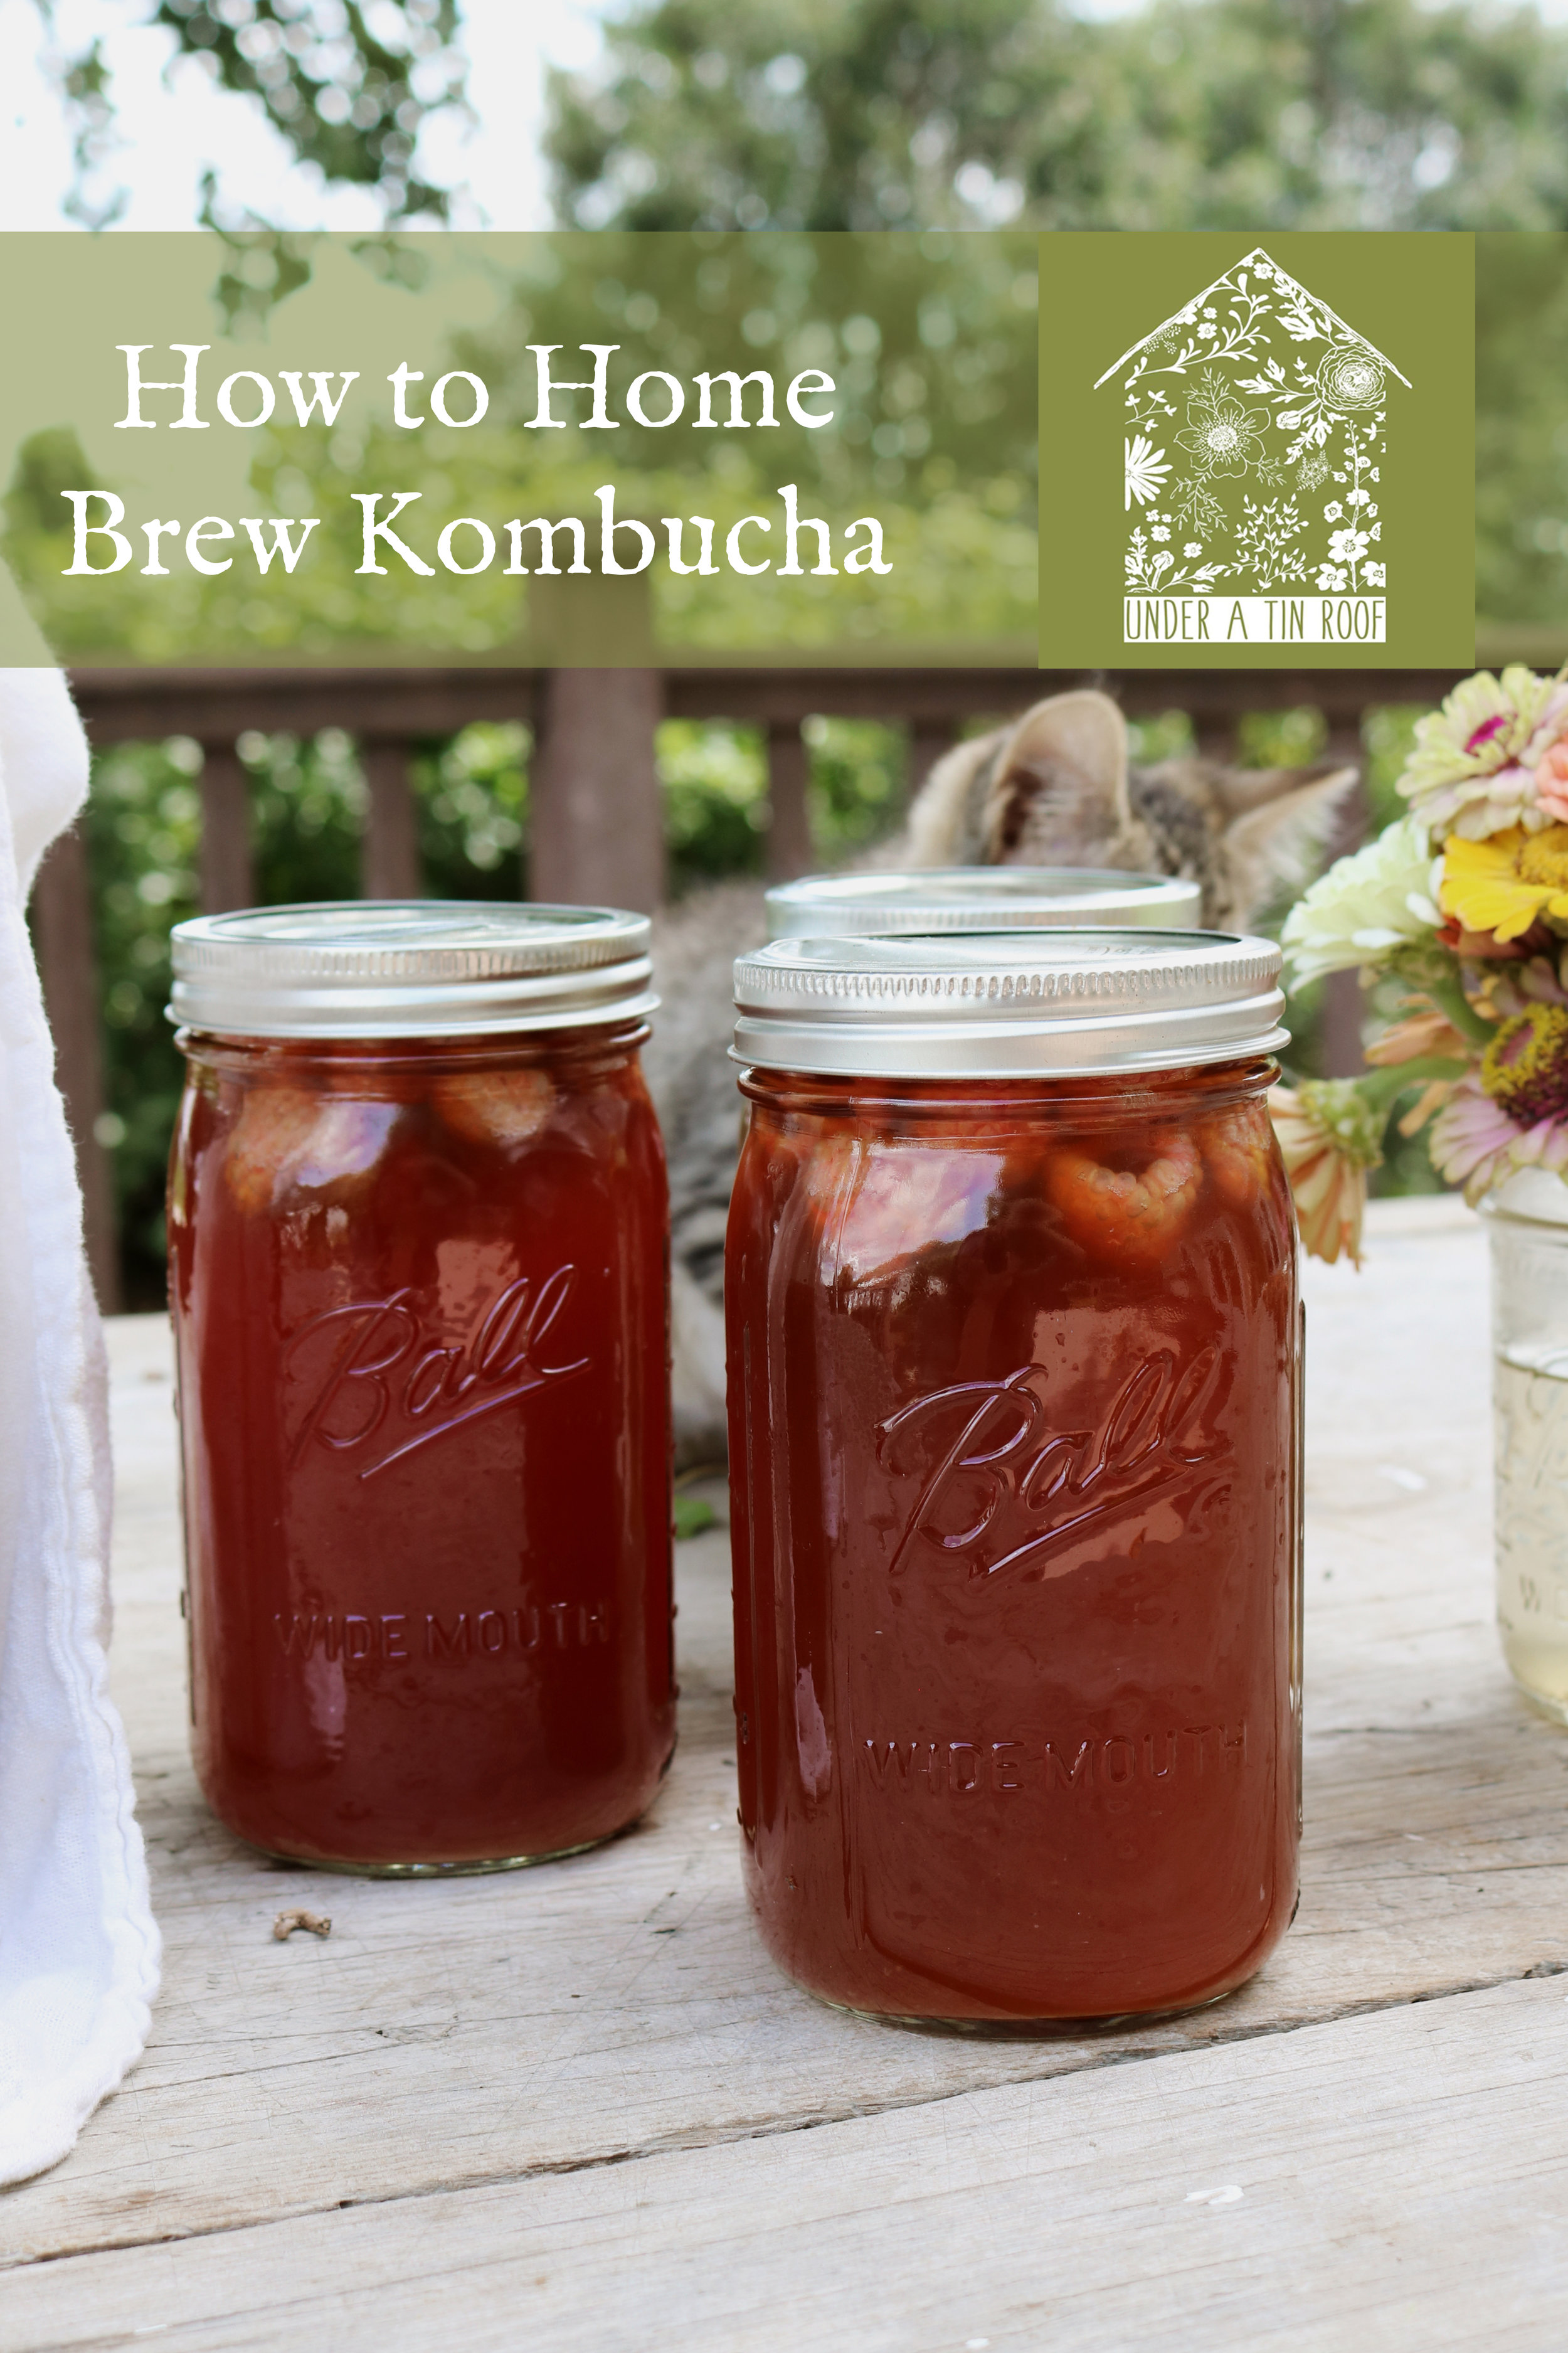 How to Make Kombucha - Under A Tin Roof Blog